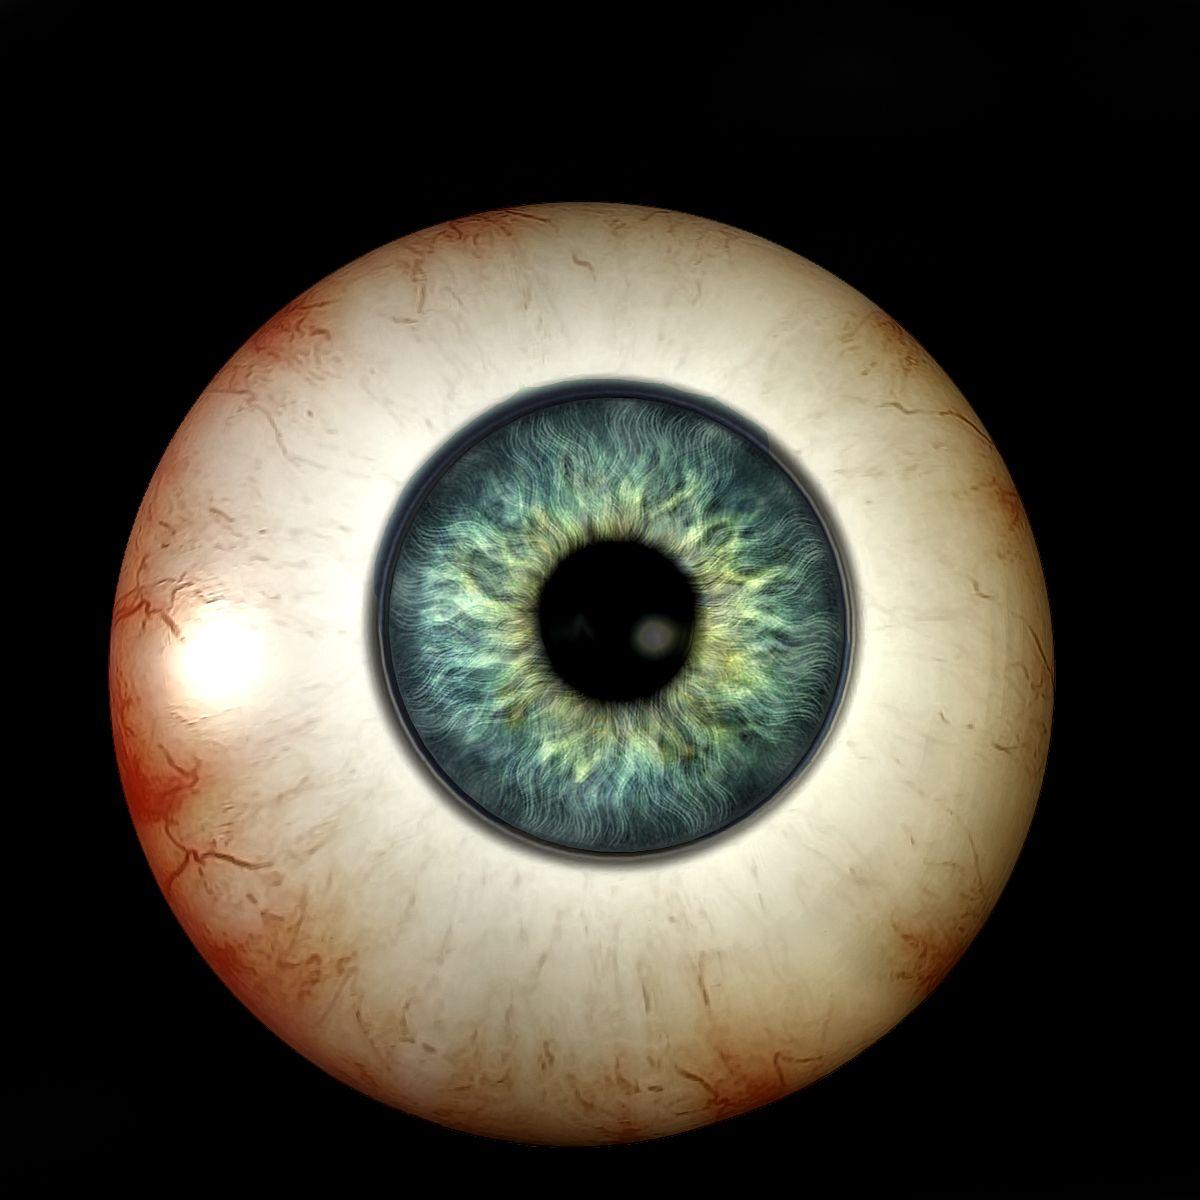 Eye Balls It S Just Eyeballs Creepy Eyeballs Staring At You Sideways Creepy Eyes Cow Eyes Eyeball Tattoo